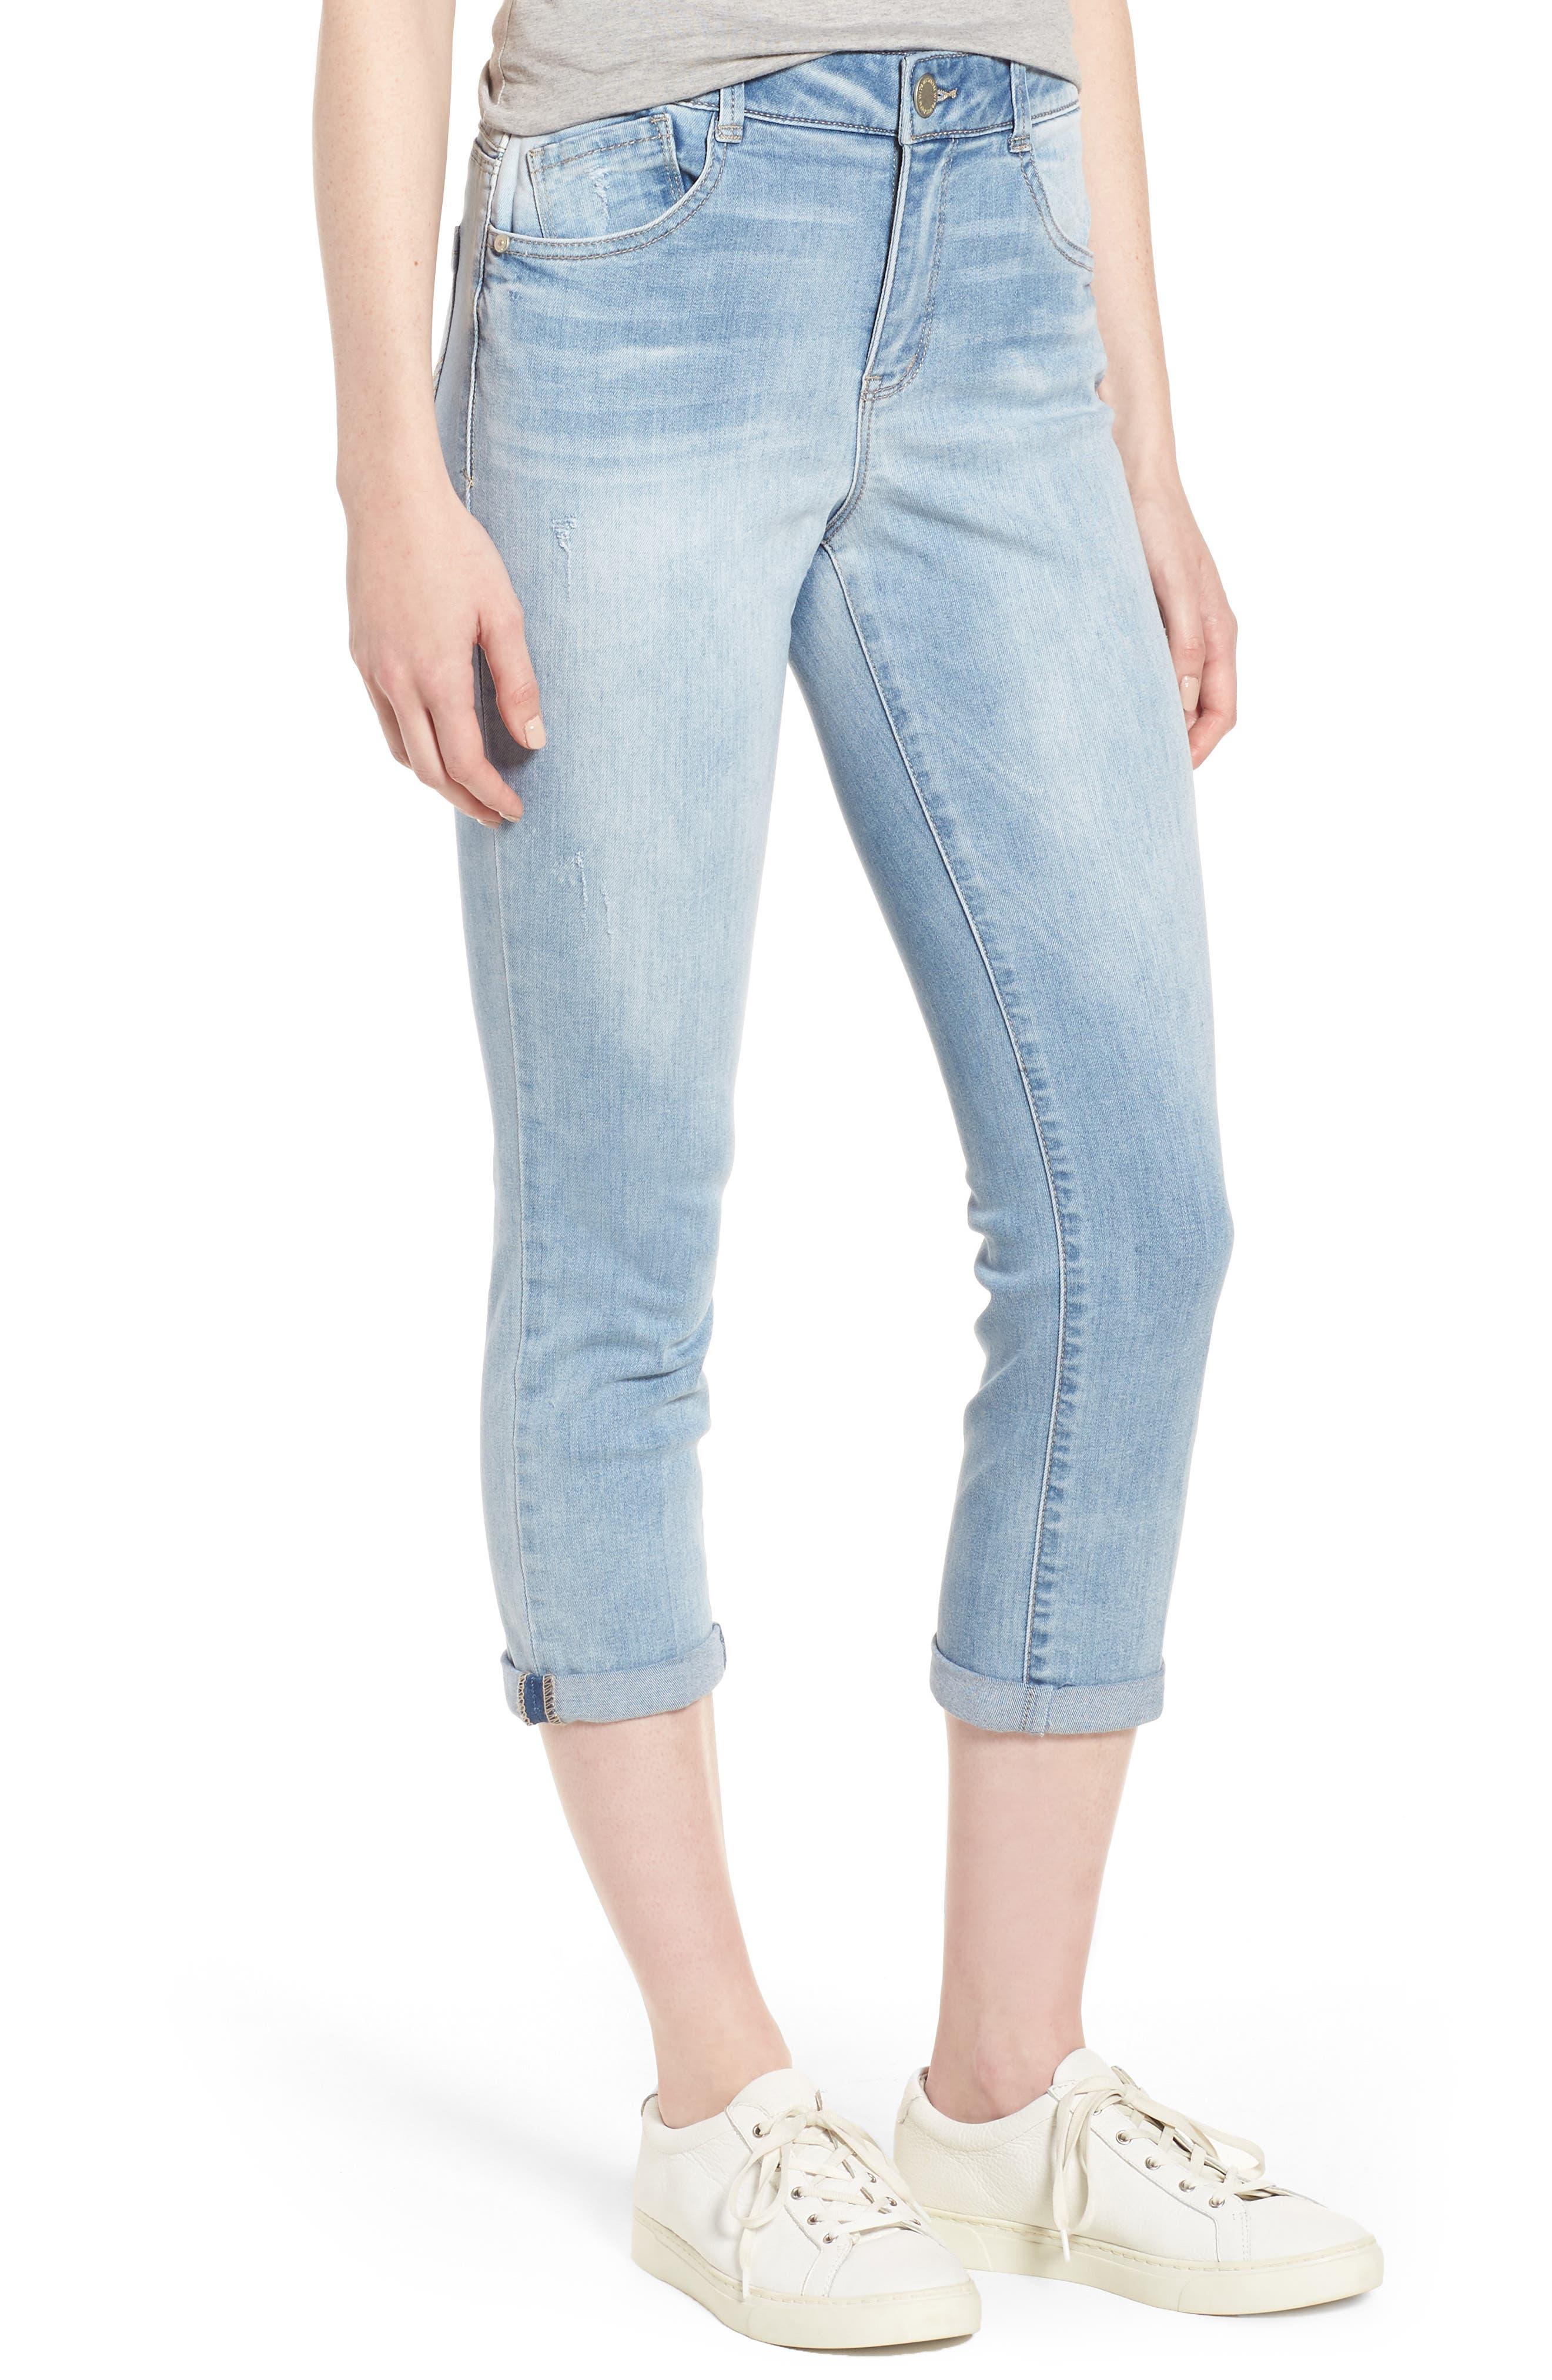 Ab-solution High Rise Crop Jeans,                         Main,                         color, Light Blue